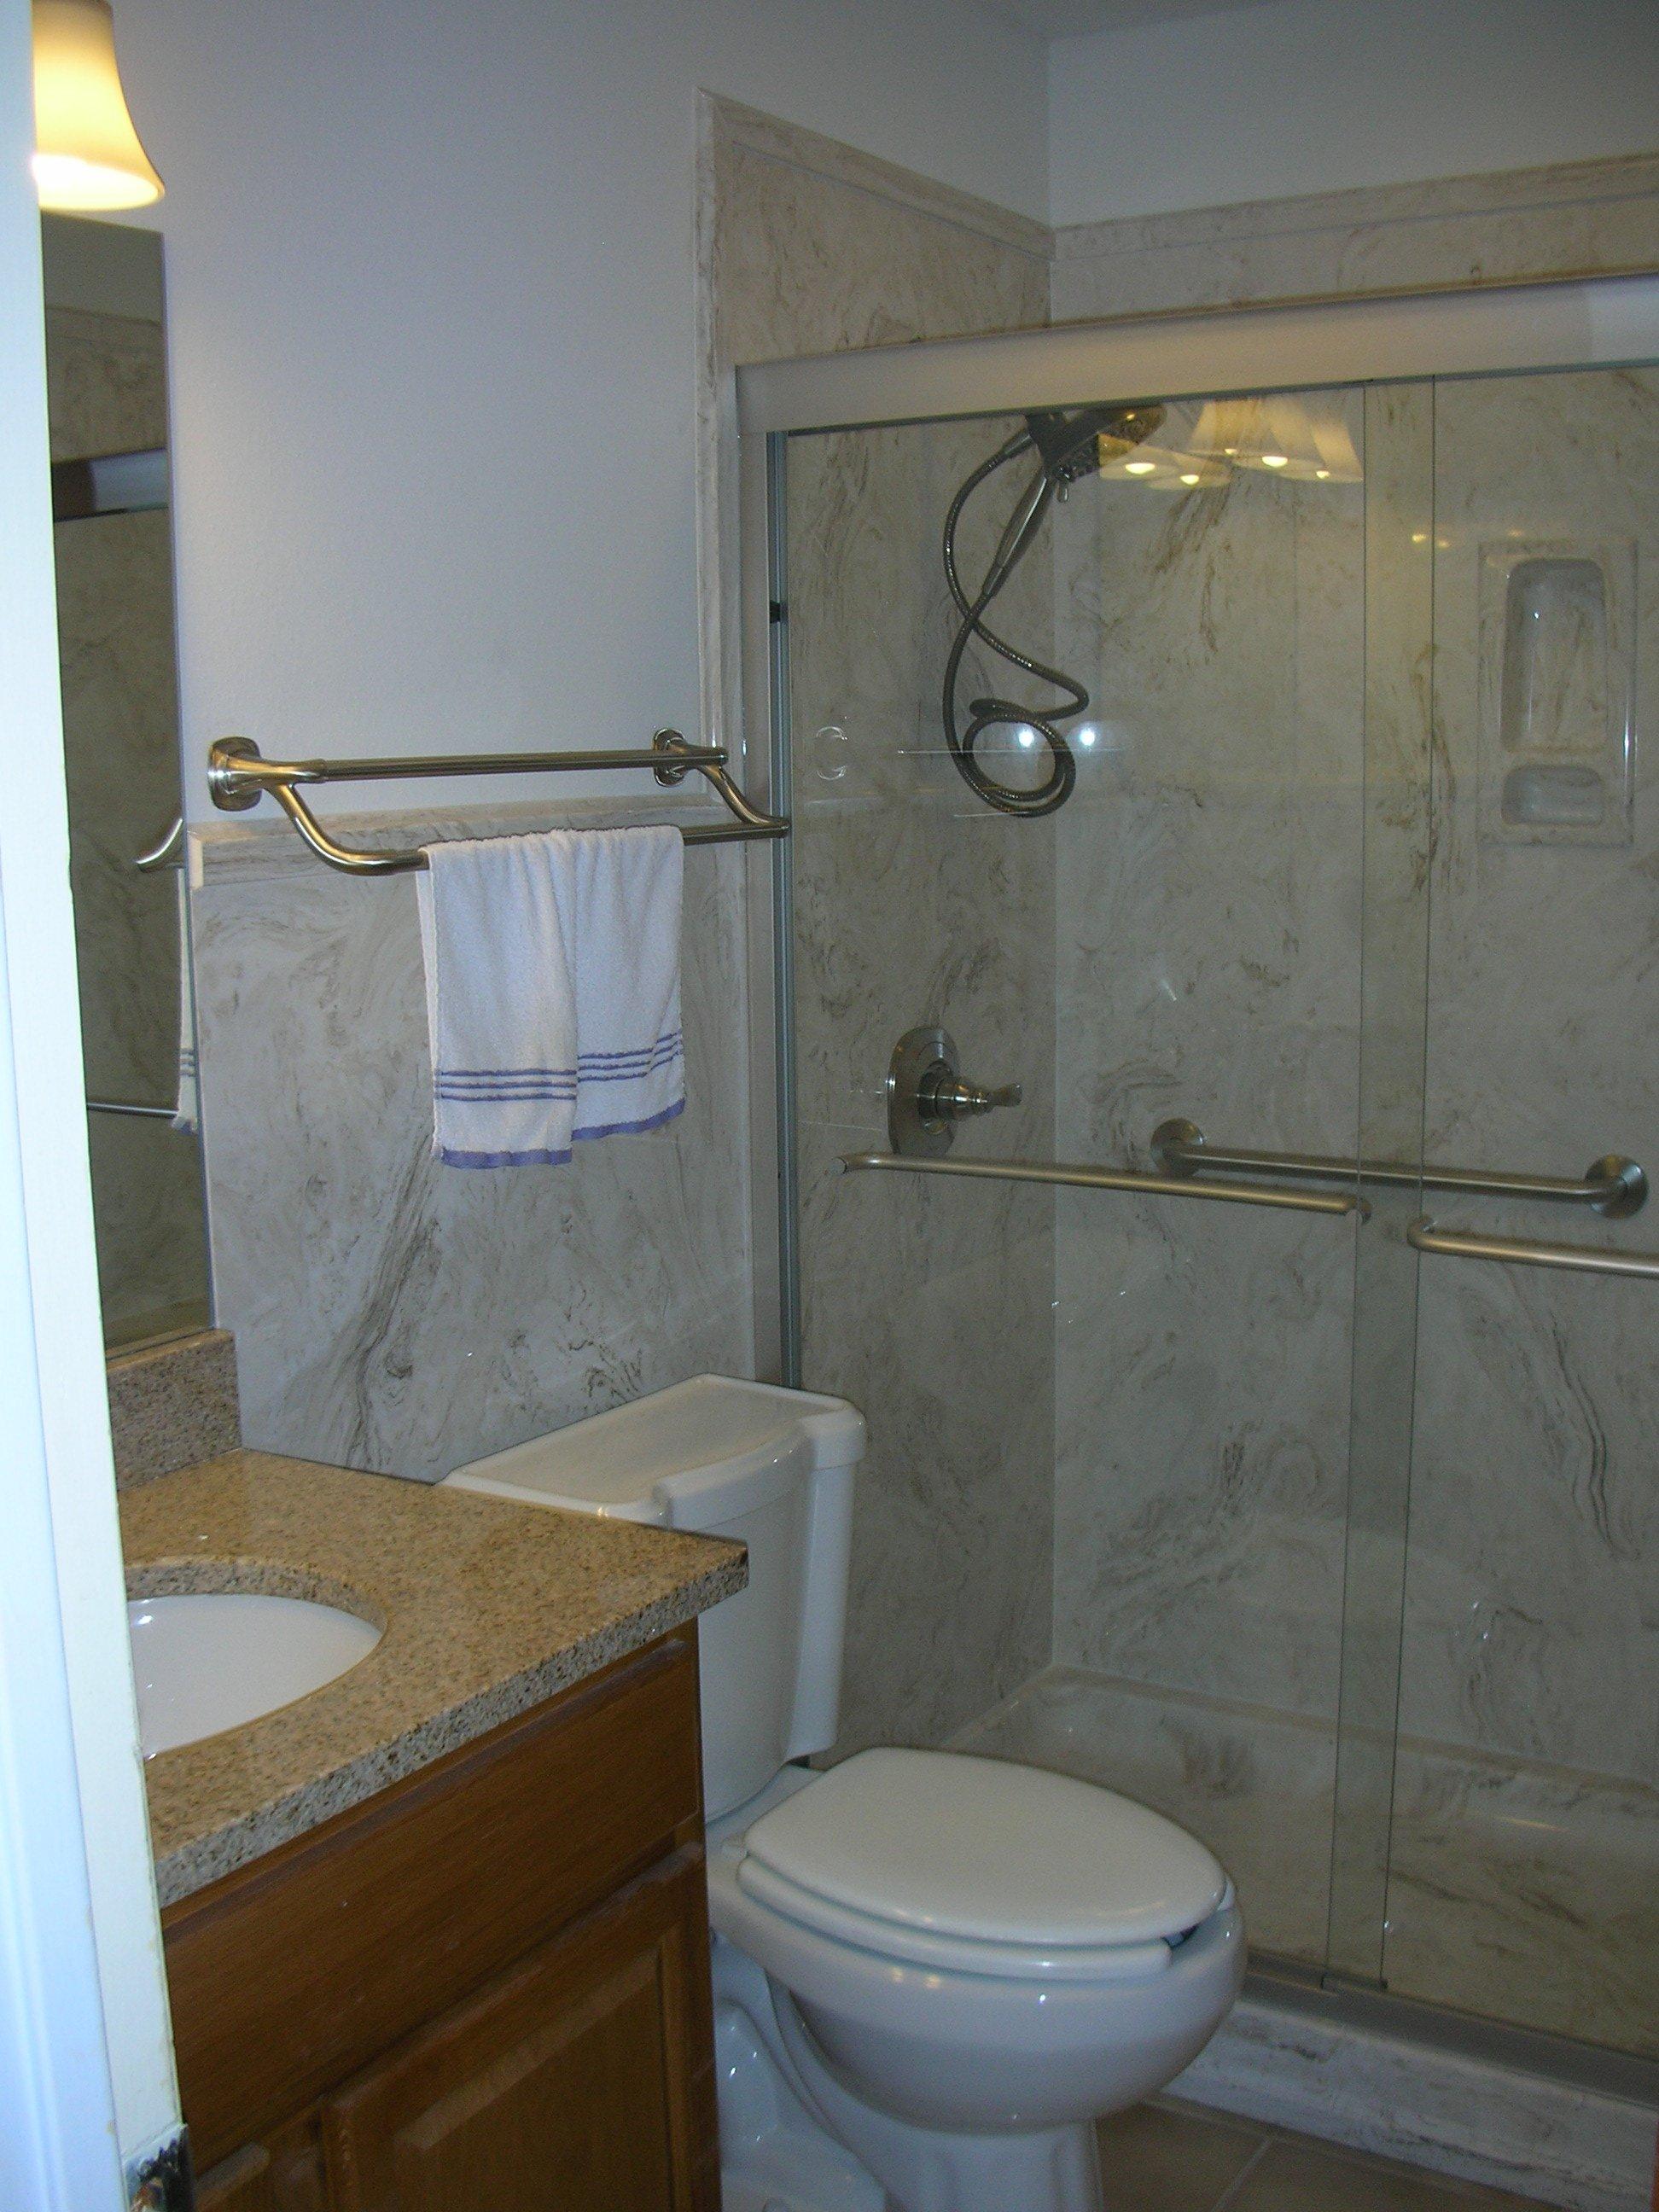 Gallery Cantonment Pensacola FL Harlow Plumbing - Plumber bathroom renovation